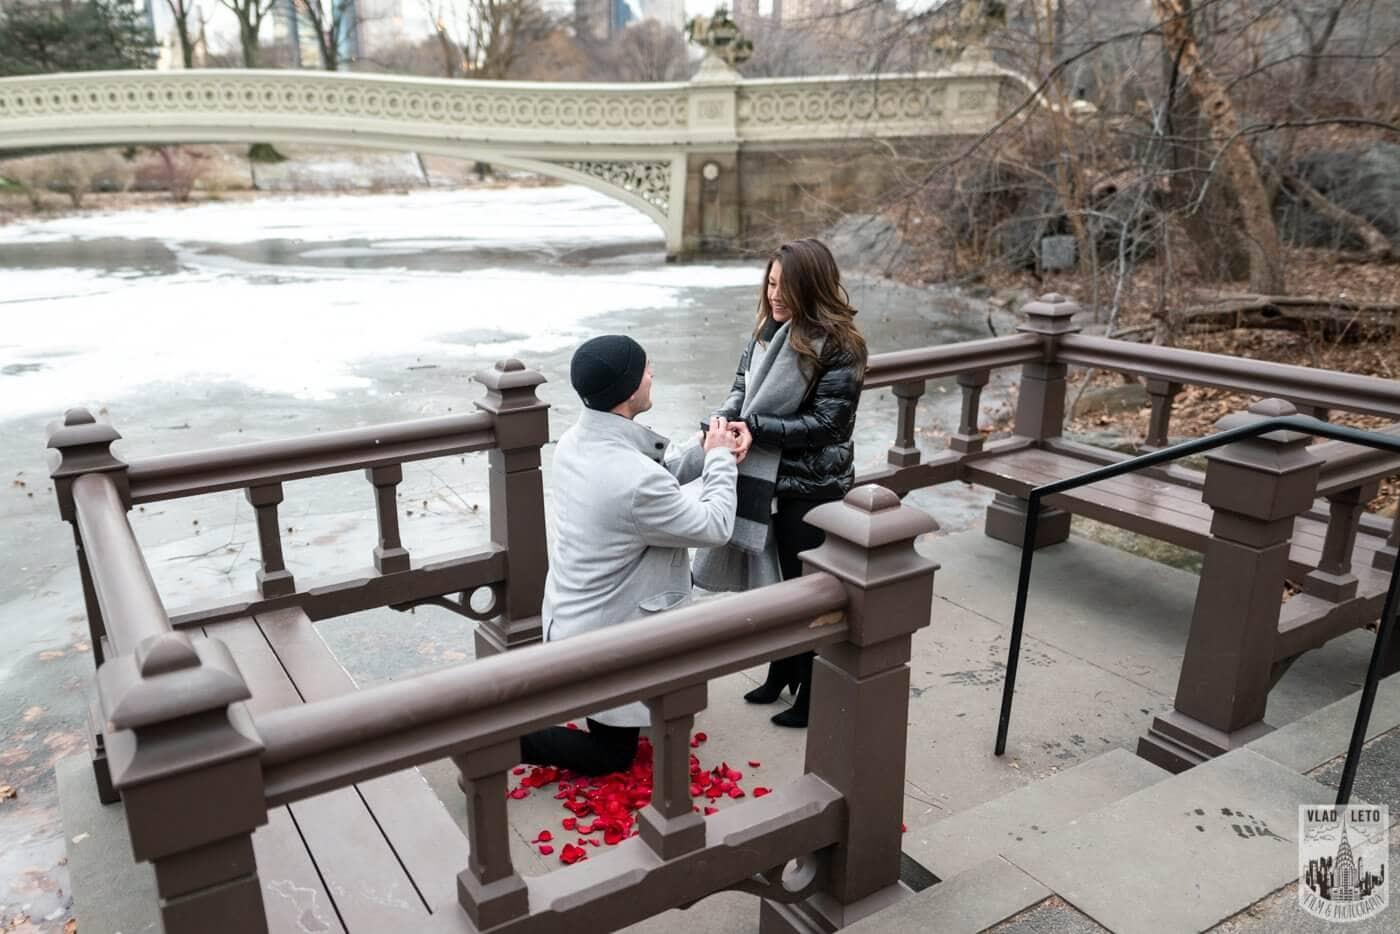 Photo 3 Bow bridge surprise marriage proposal. | VladLeto